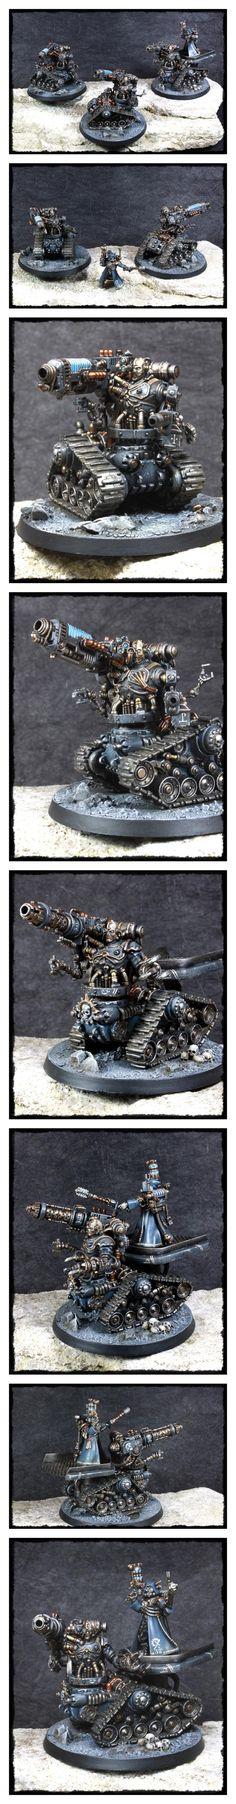 AdMech Kataphron Destroyers, Achlys Tertius  Achlys Iii, Adeptus Mechanicus, Admech, Alpha, Kataphrons, Skitarii, Warhammer 40,000